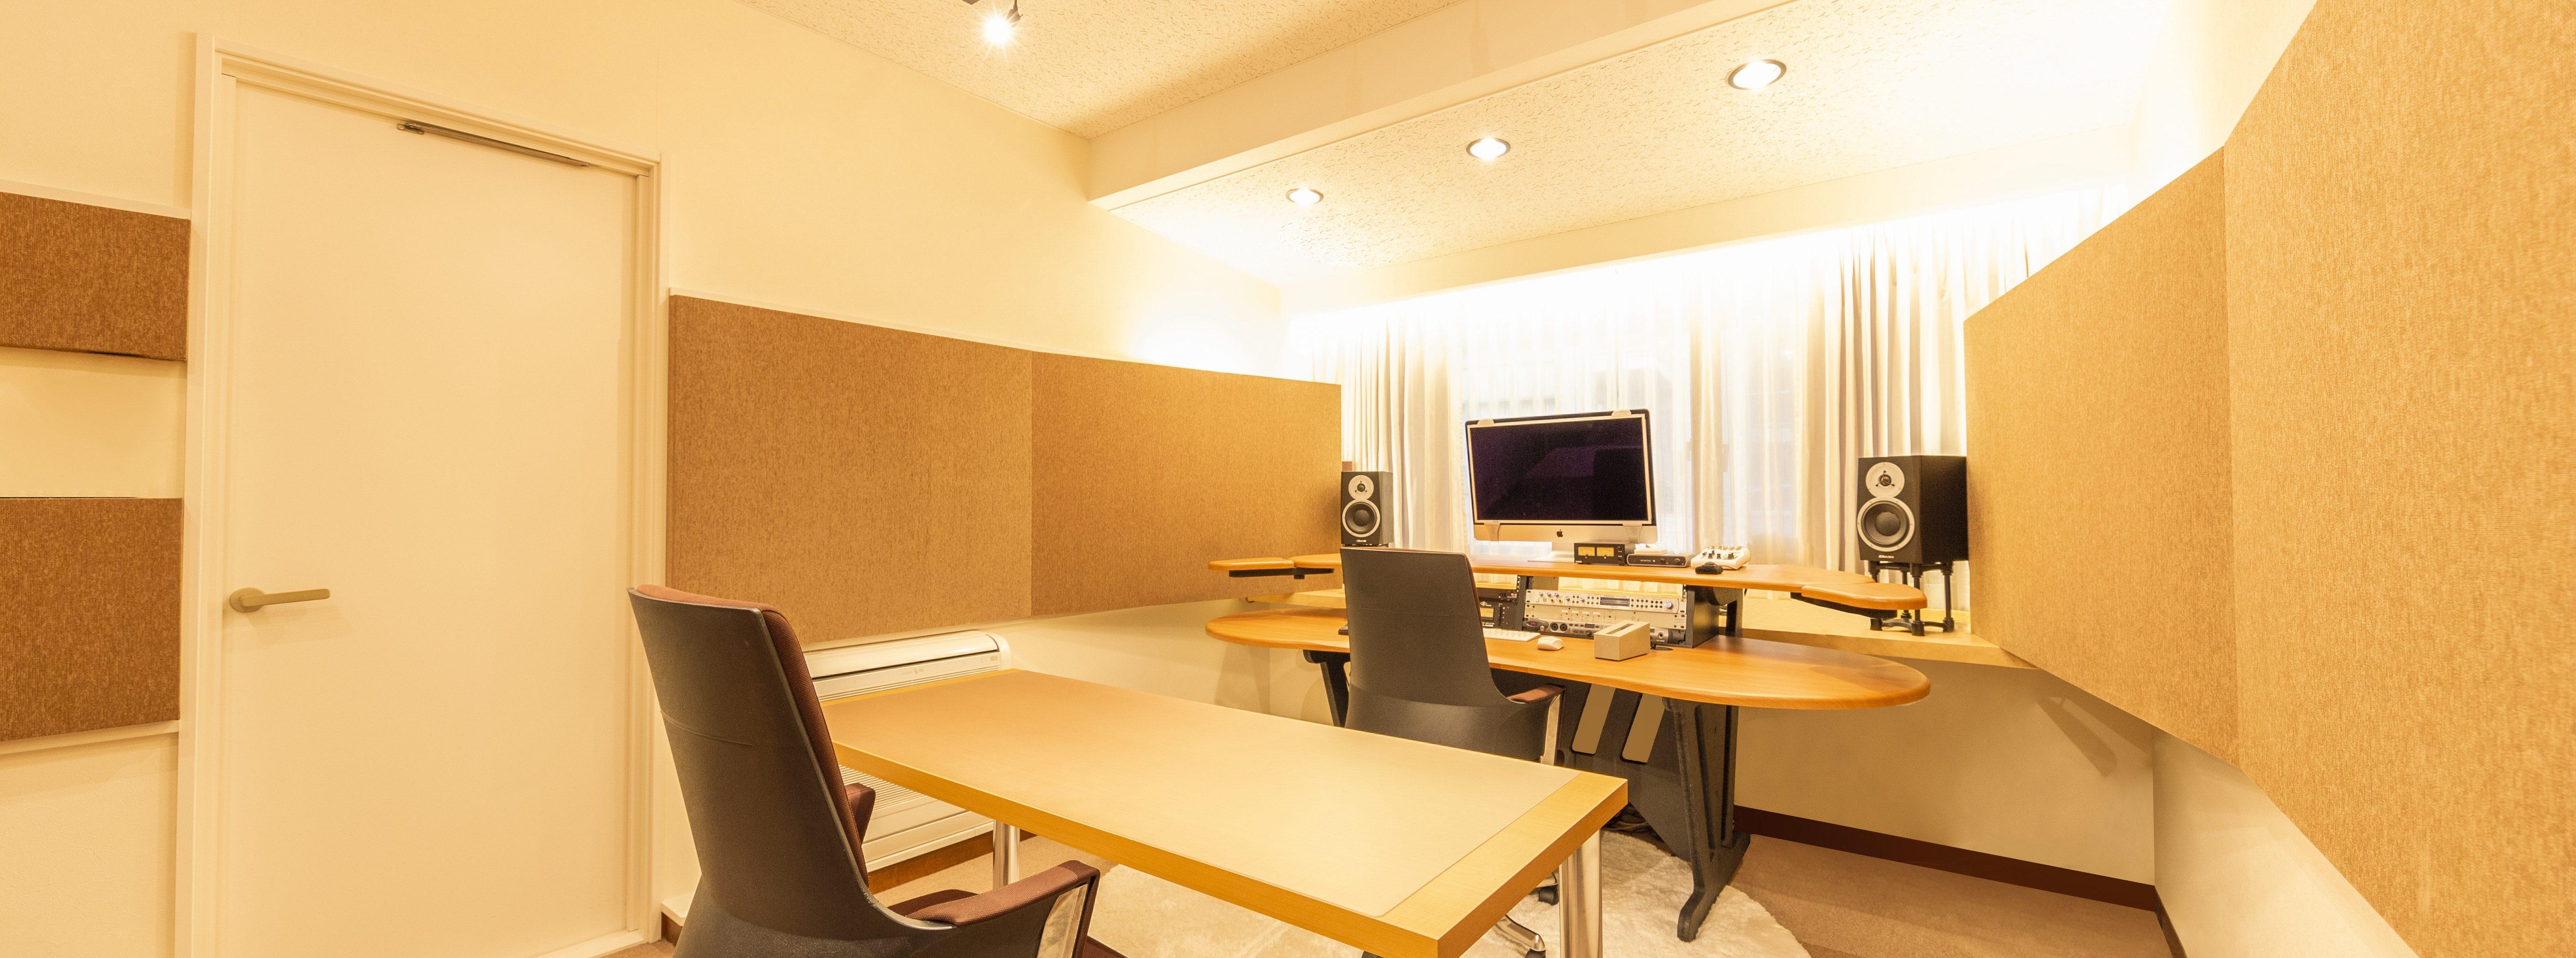 1st STUDIO Control Room